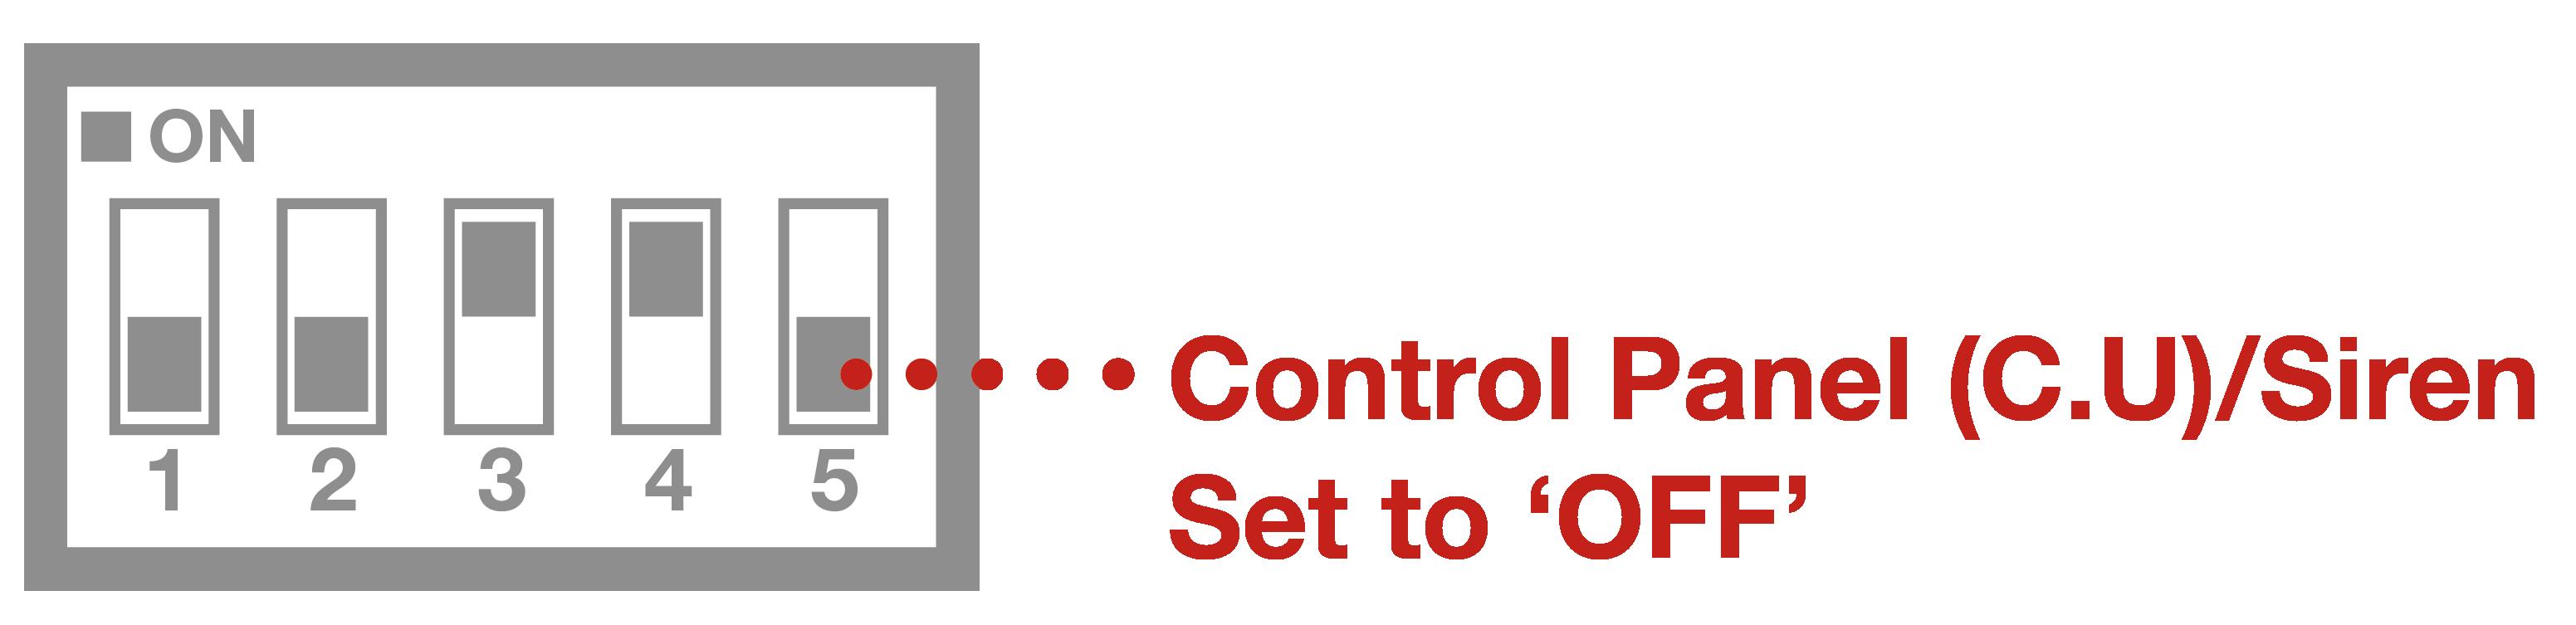 bss_control_panel